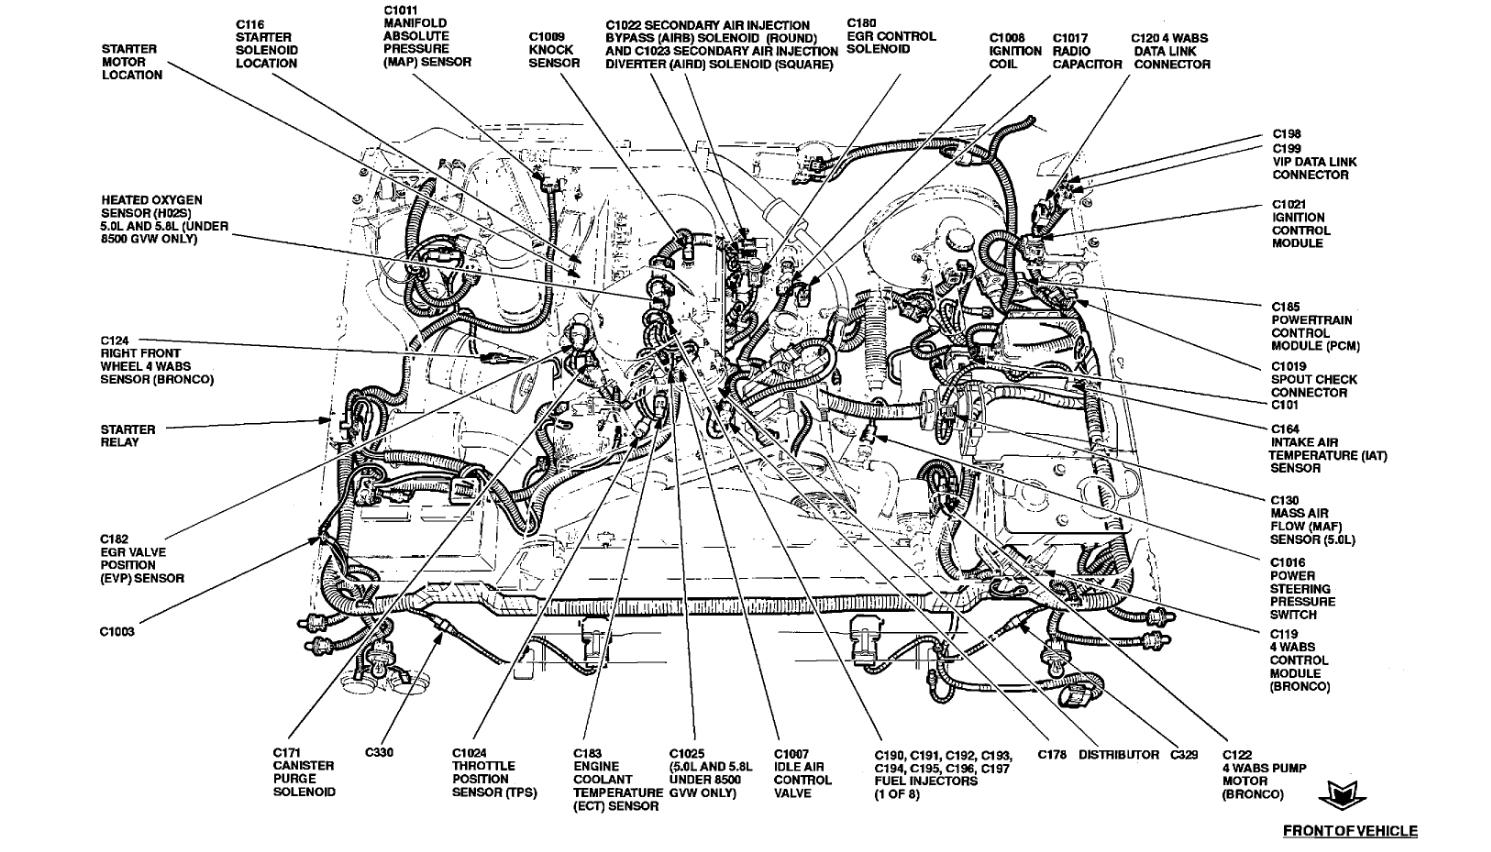 1994 F150 4 9l Engine Diagram Toro Sand Pro Engine Wiring Schematic Ct90 Sampaibila Jeanjaures37 Fr